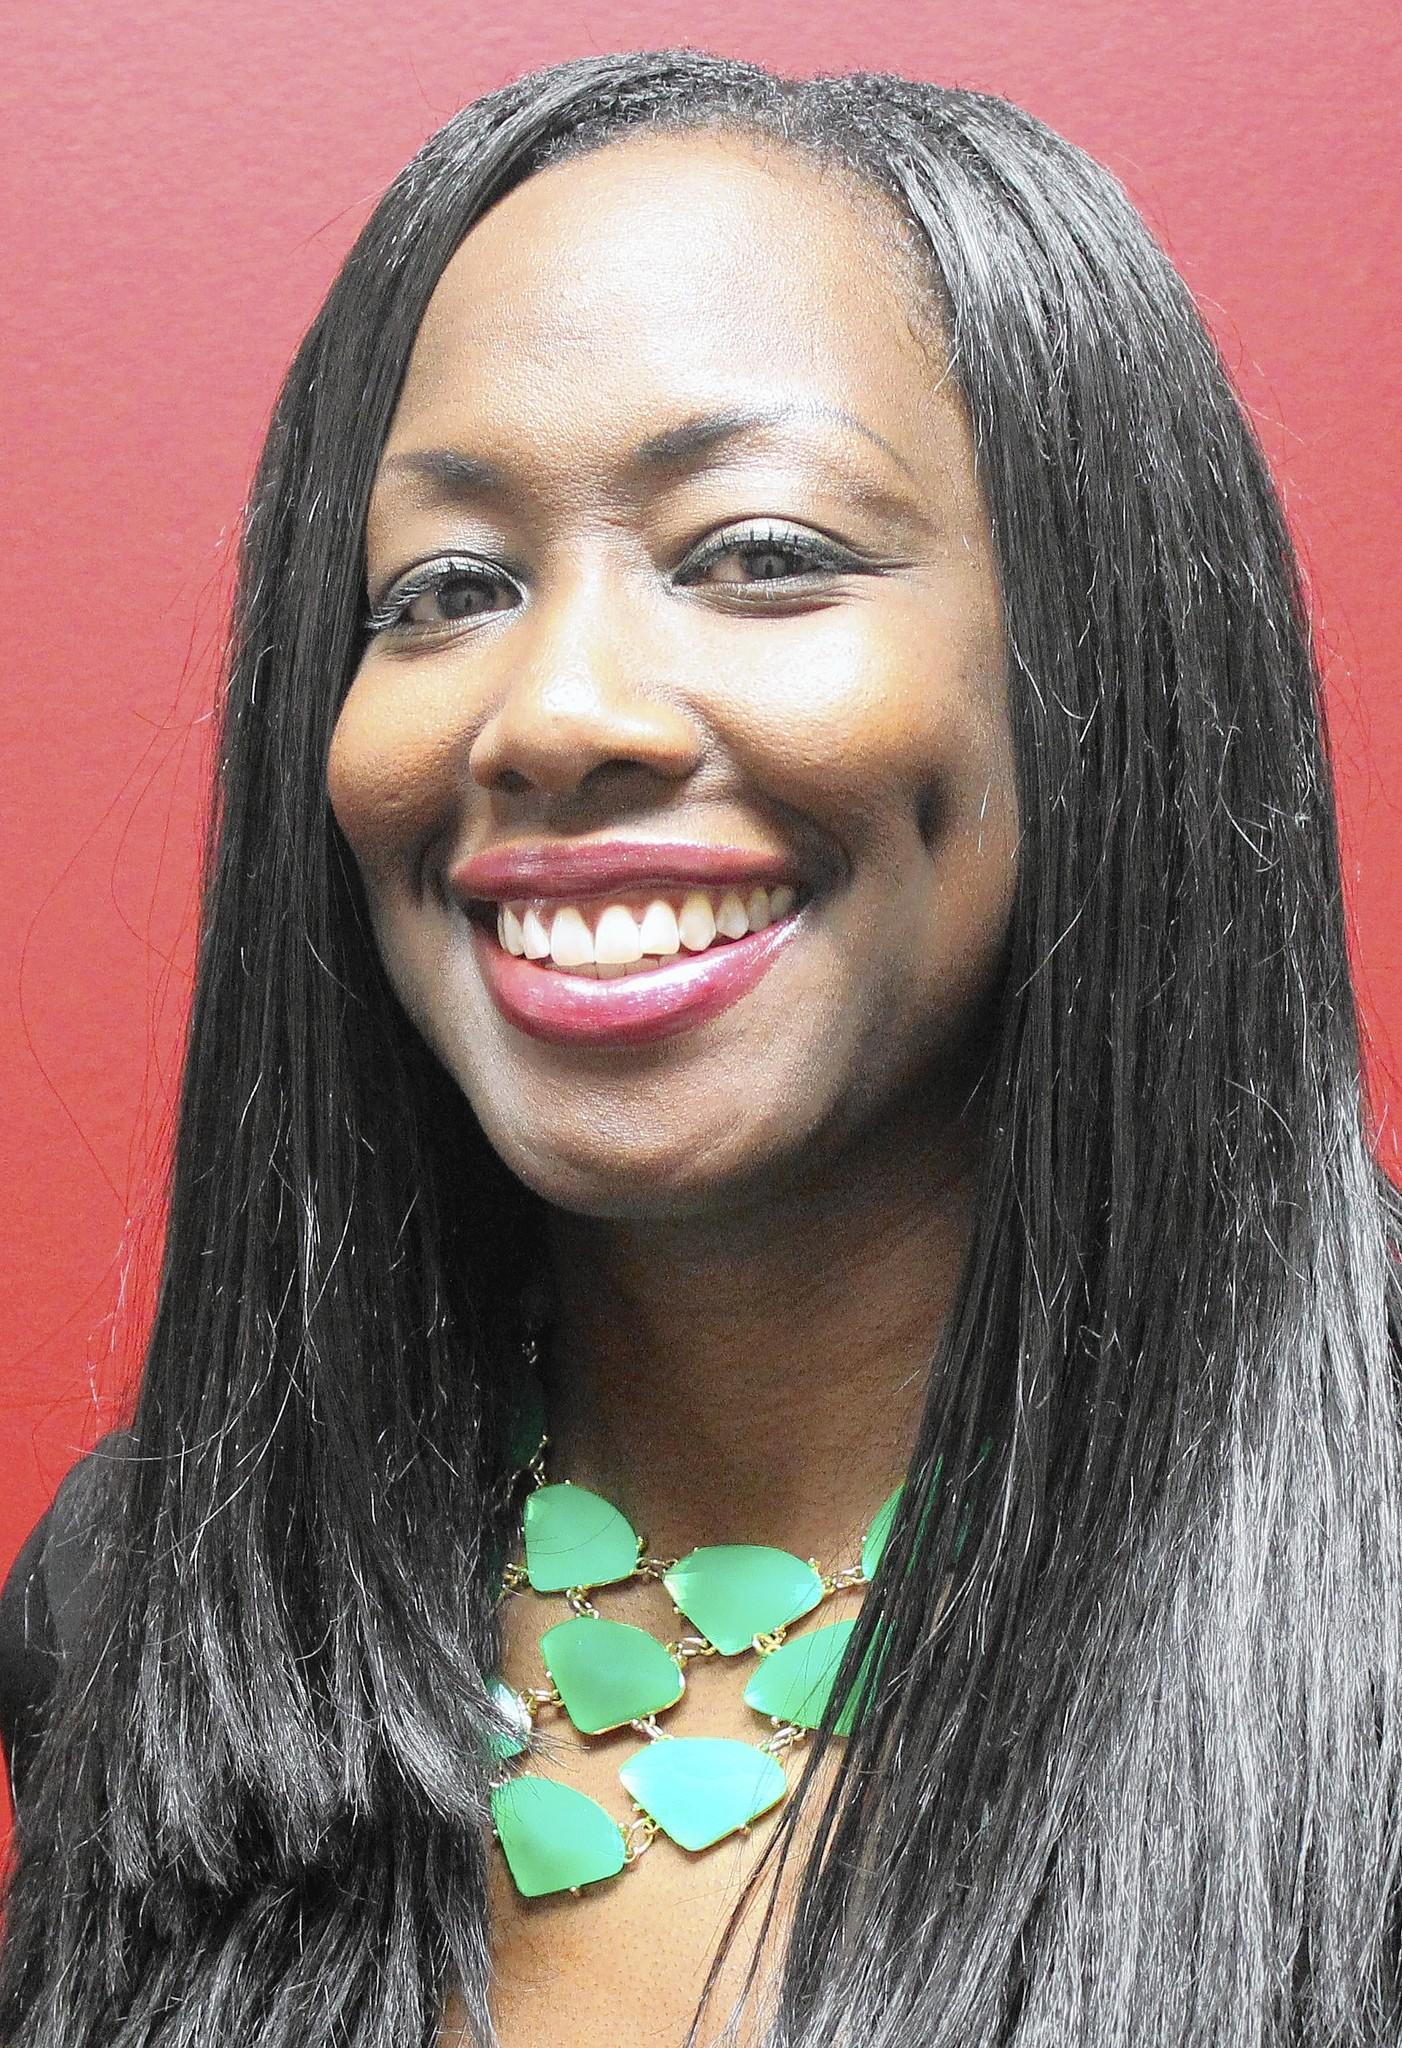 Yolanda Jordan has been named the new principal at Bolingbrook High School.